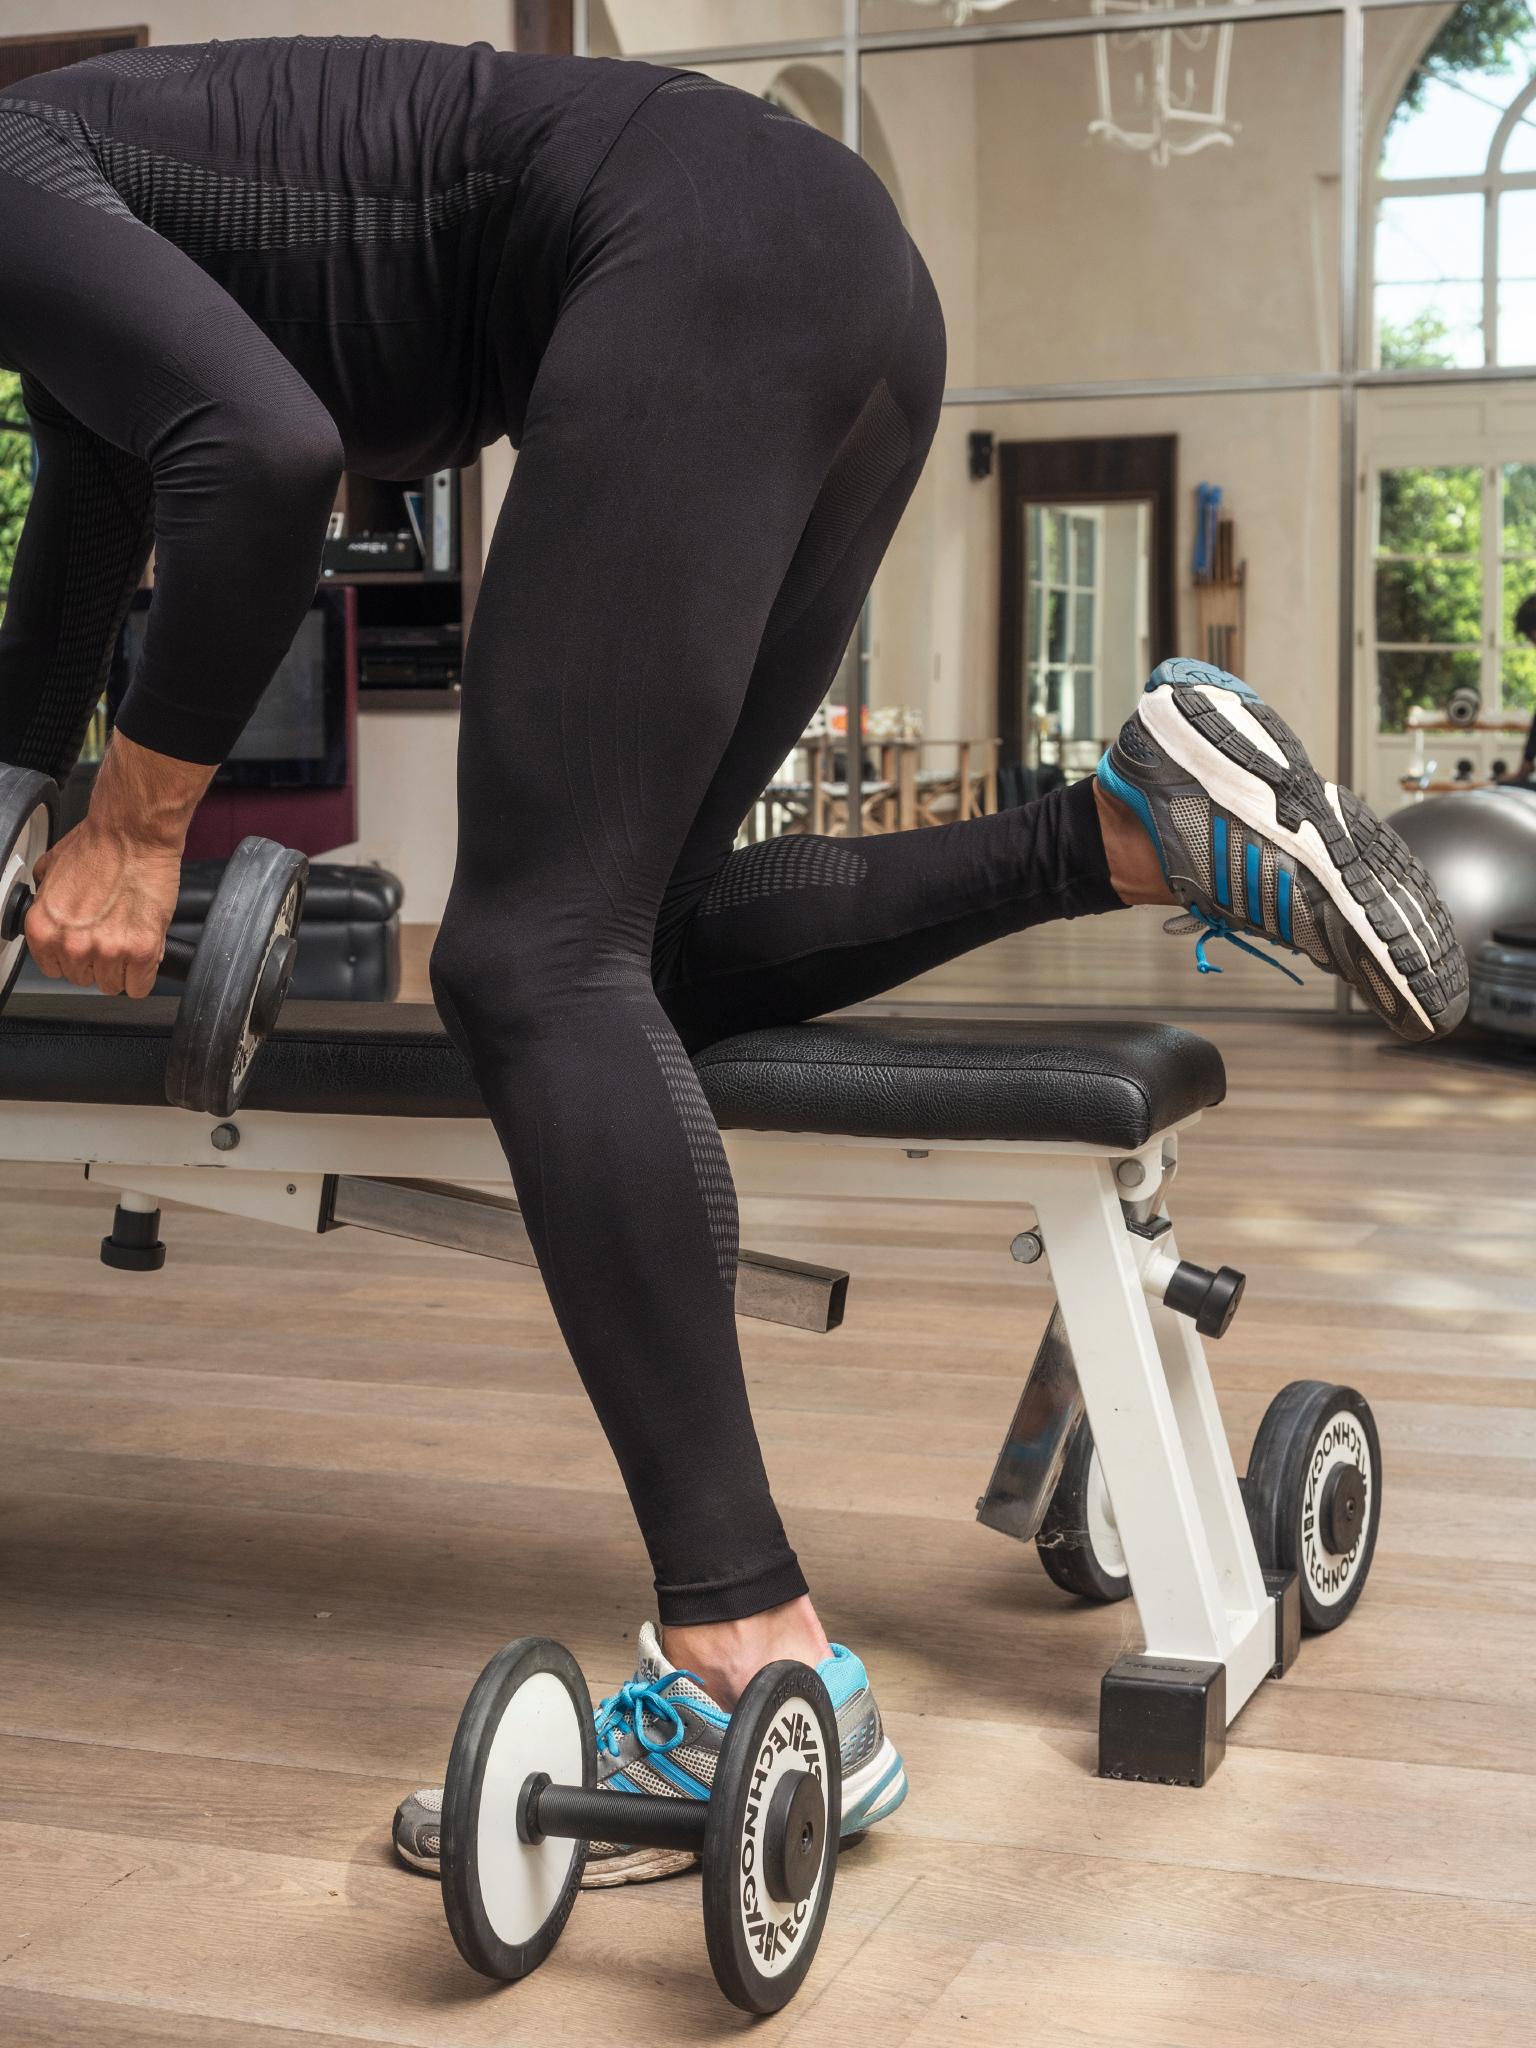 Issimo-Men-039-s-Sports-Stretchy-Leggings-Moisture-Wicking-Training-Pants thumbnail 11